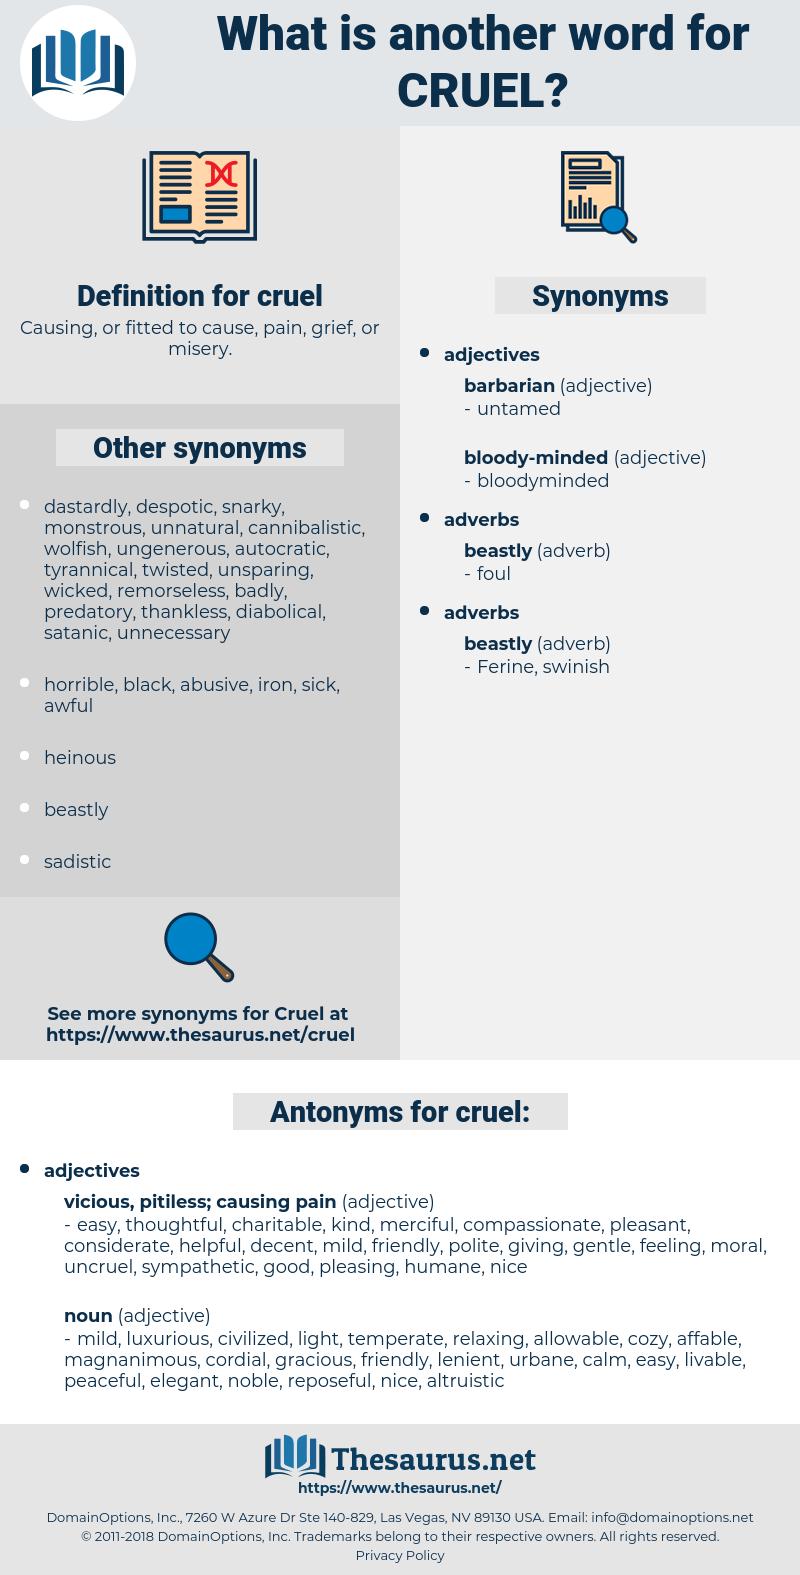 cruel, synonym cruel, another word for cruel, words like cruel, thesaurus cruel